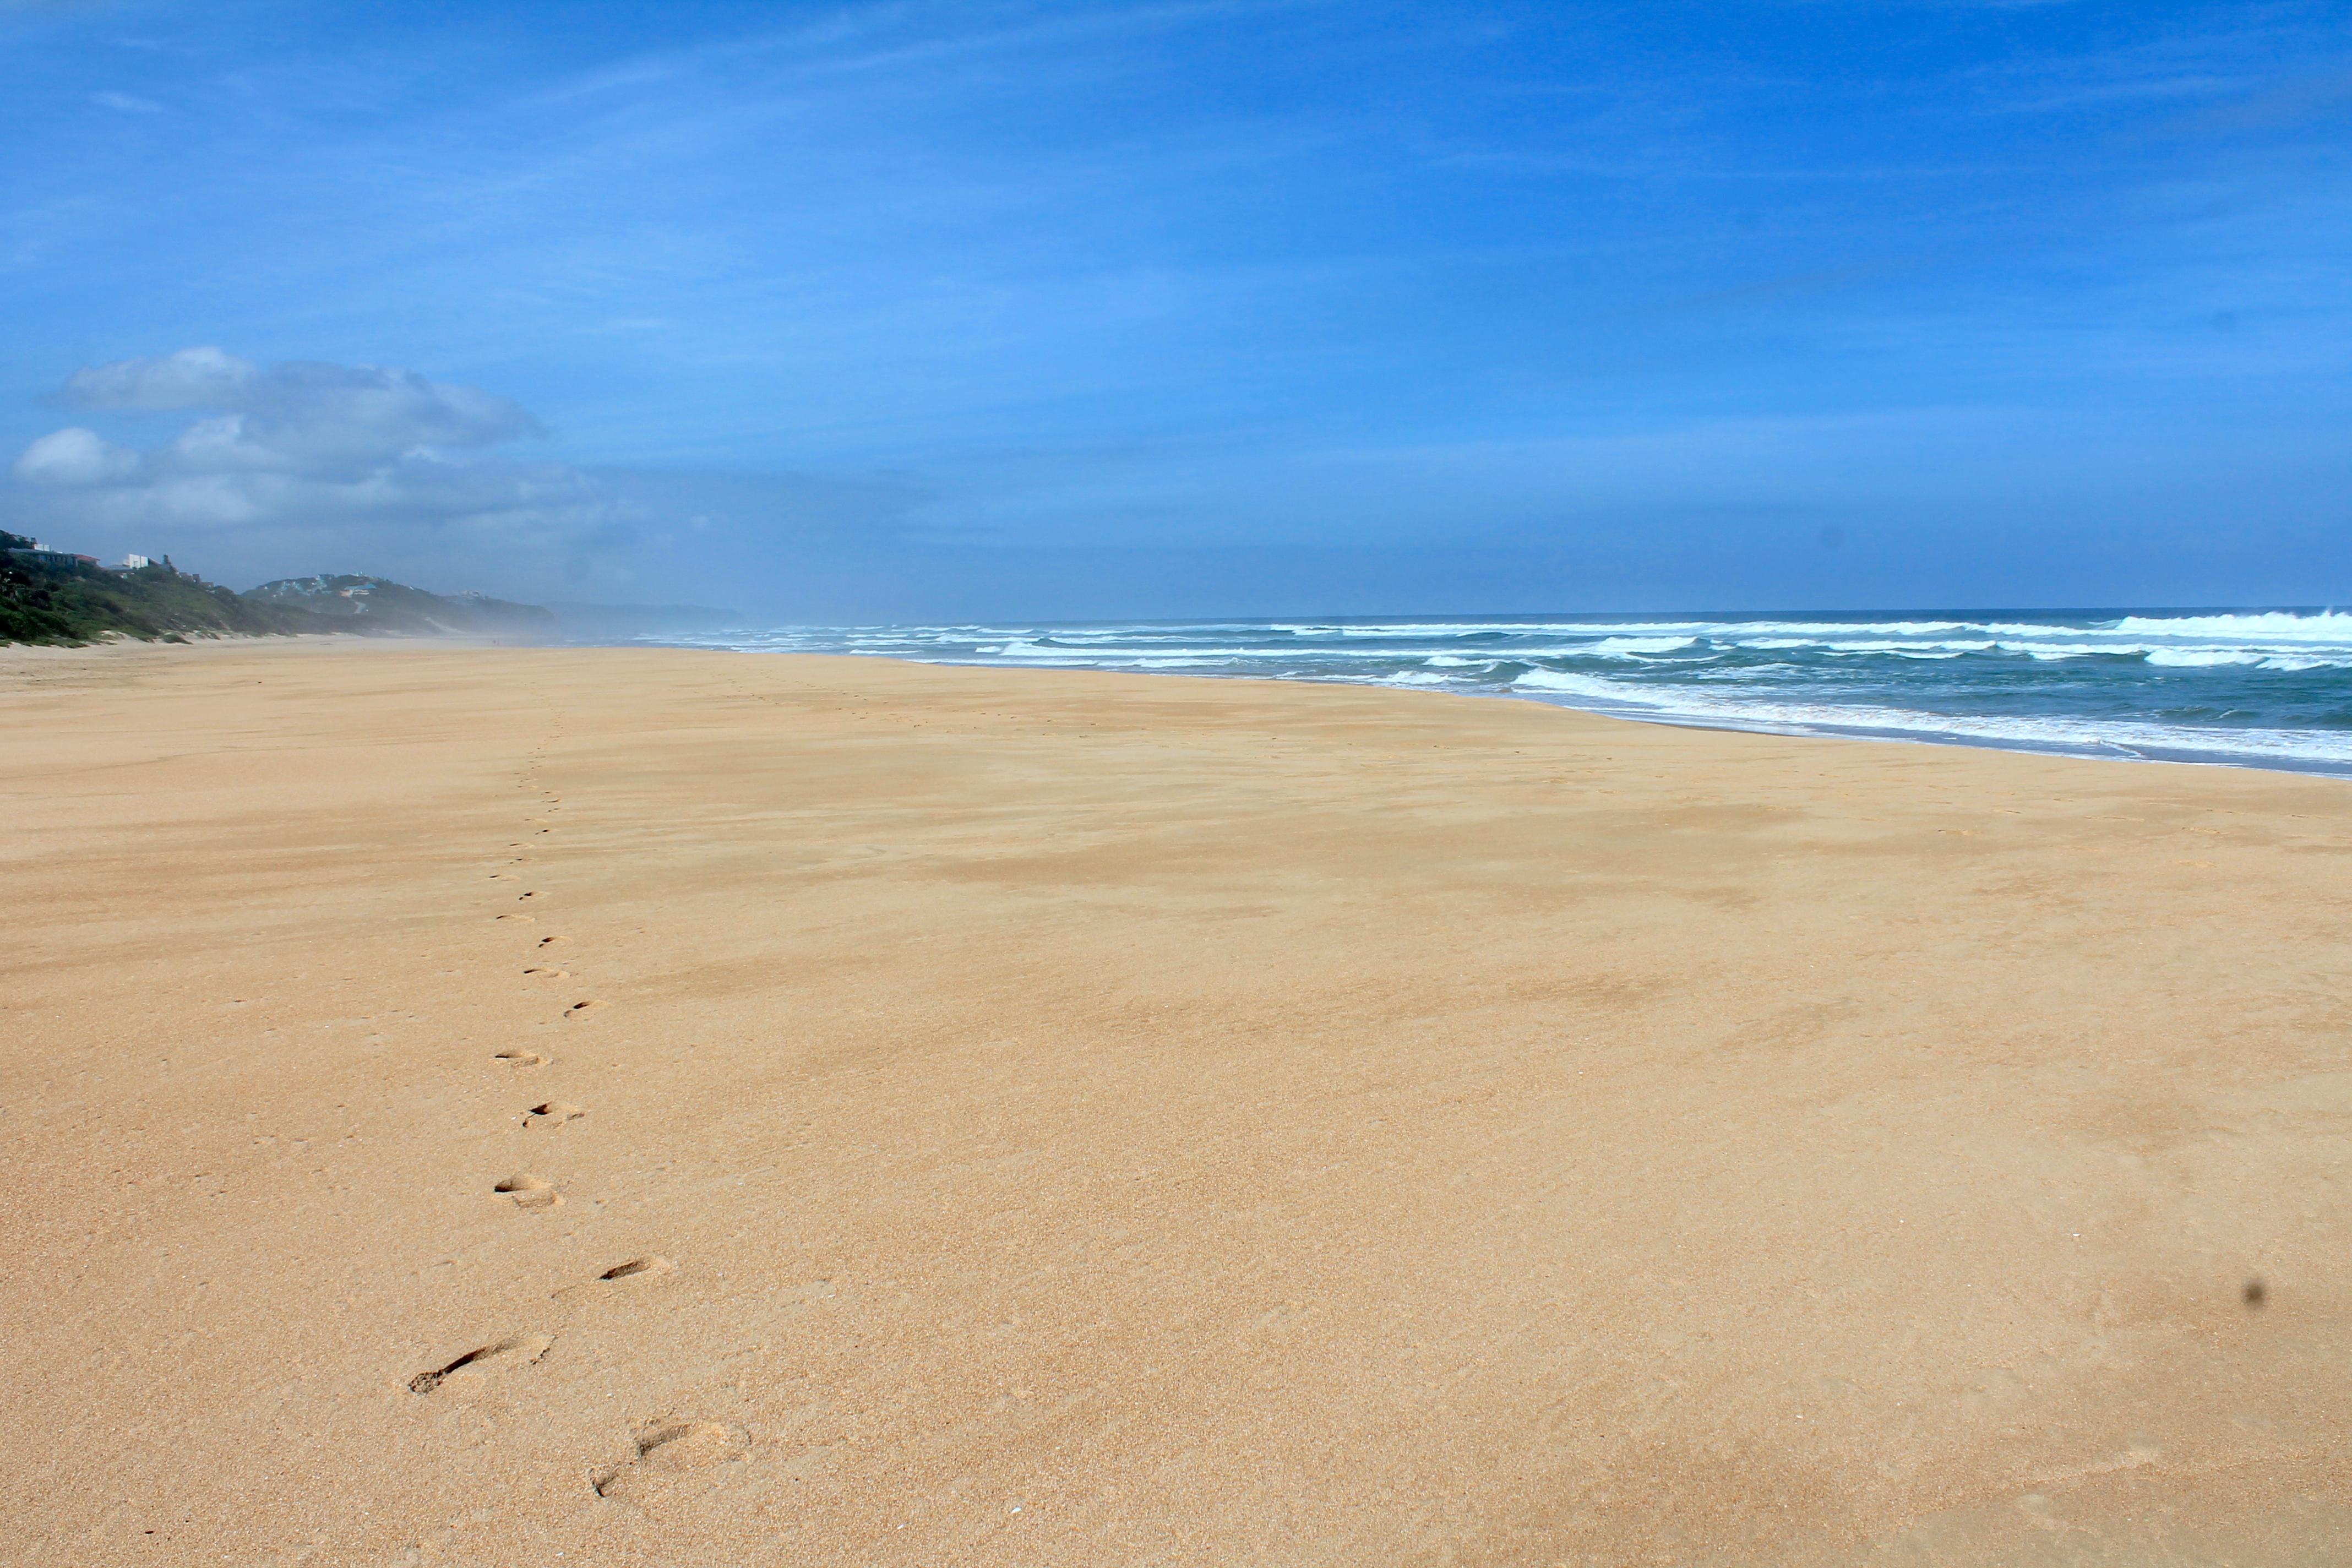 walking-beach-wilderness-africa-lustforthesublime